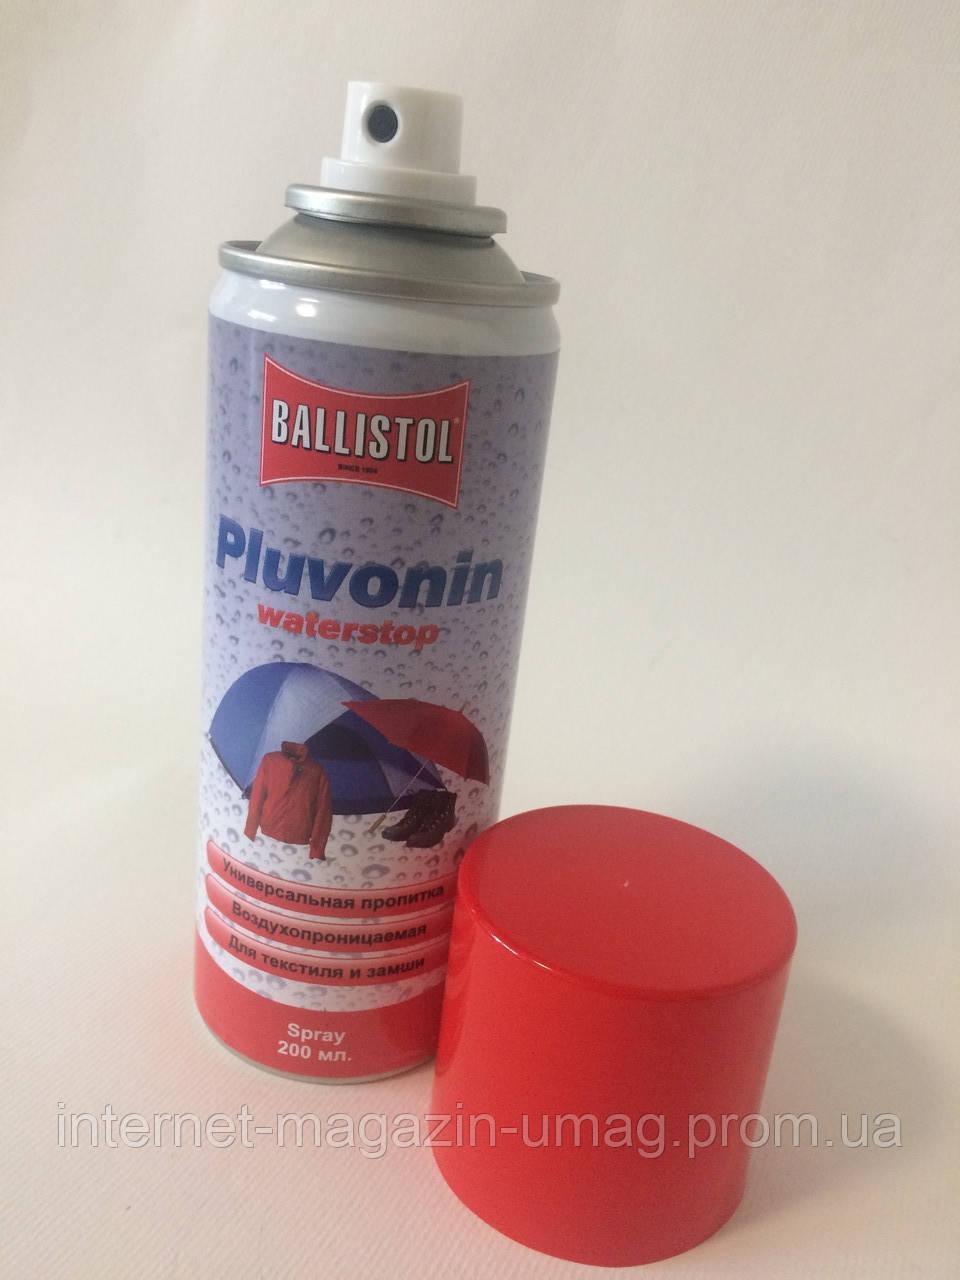 Пропитка Ballistol Pluvonin водоотталкивающая 200 мл